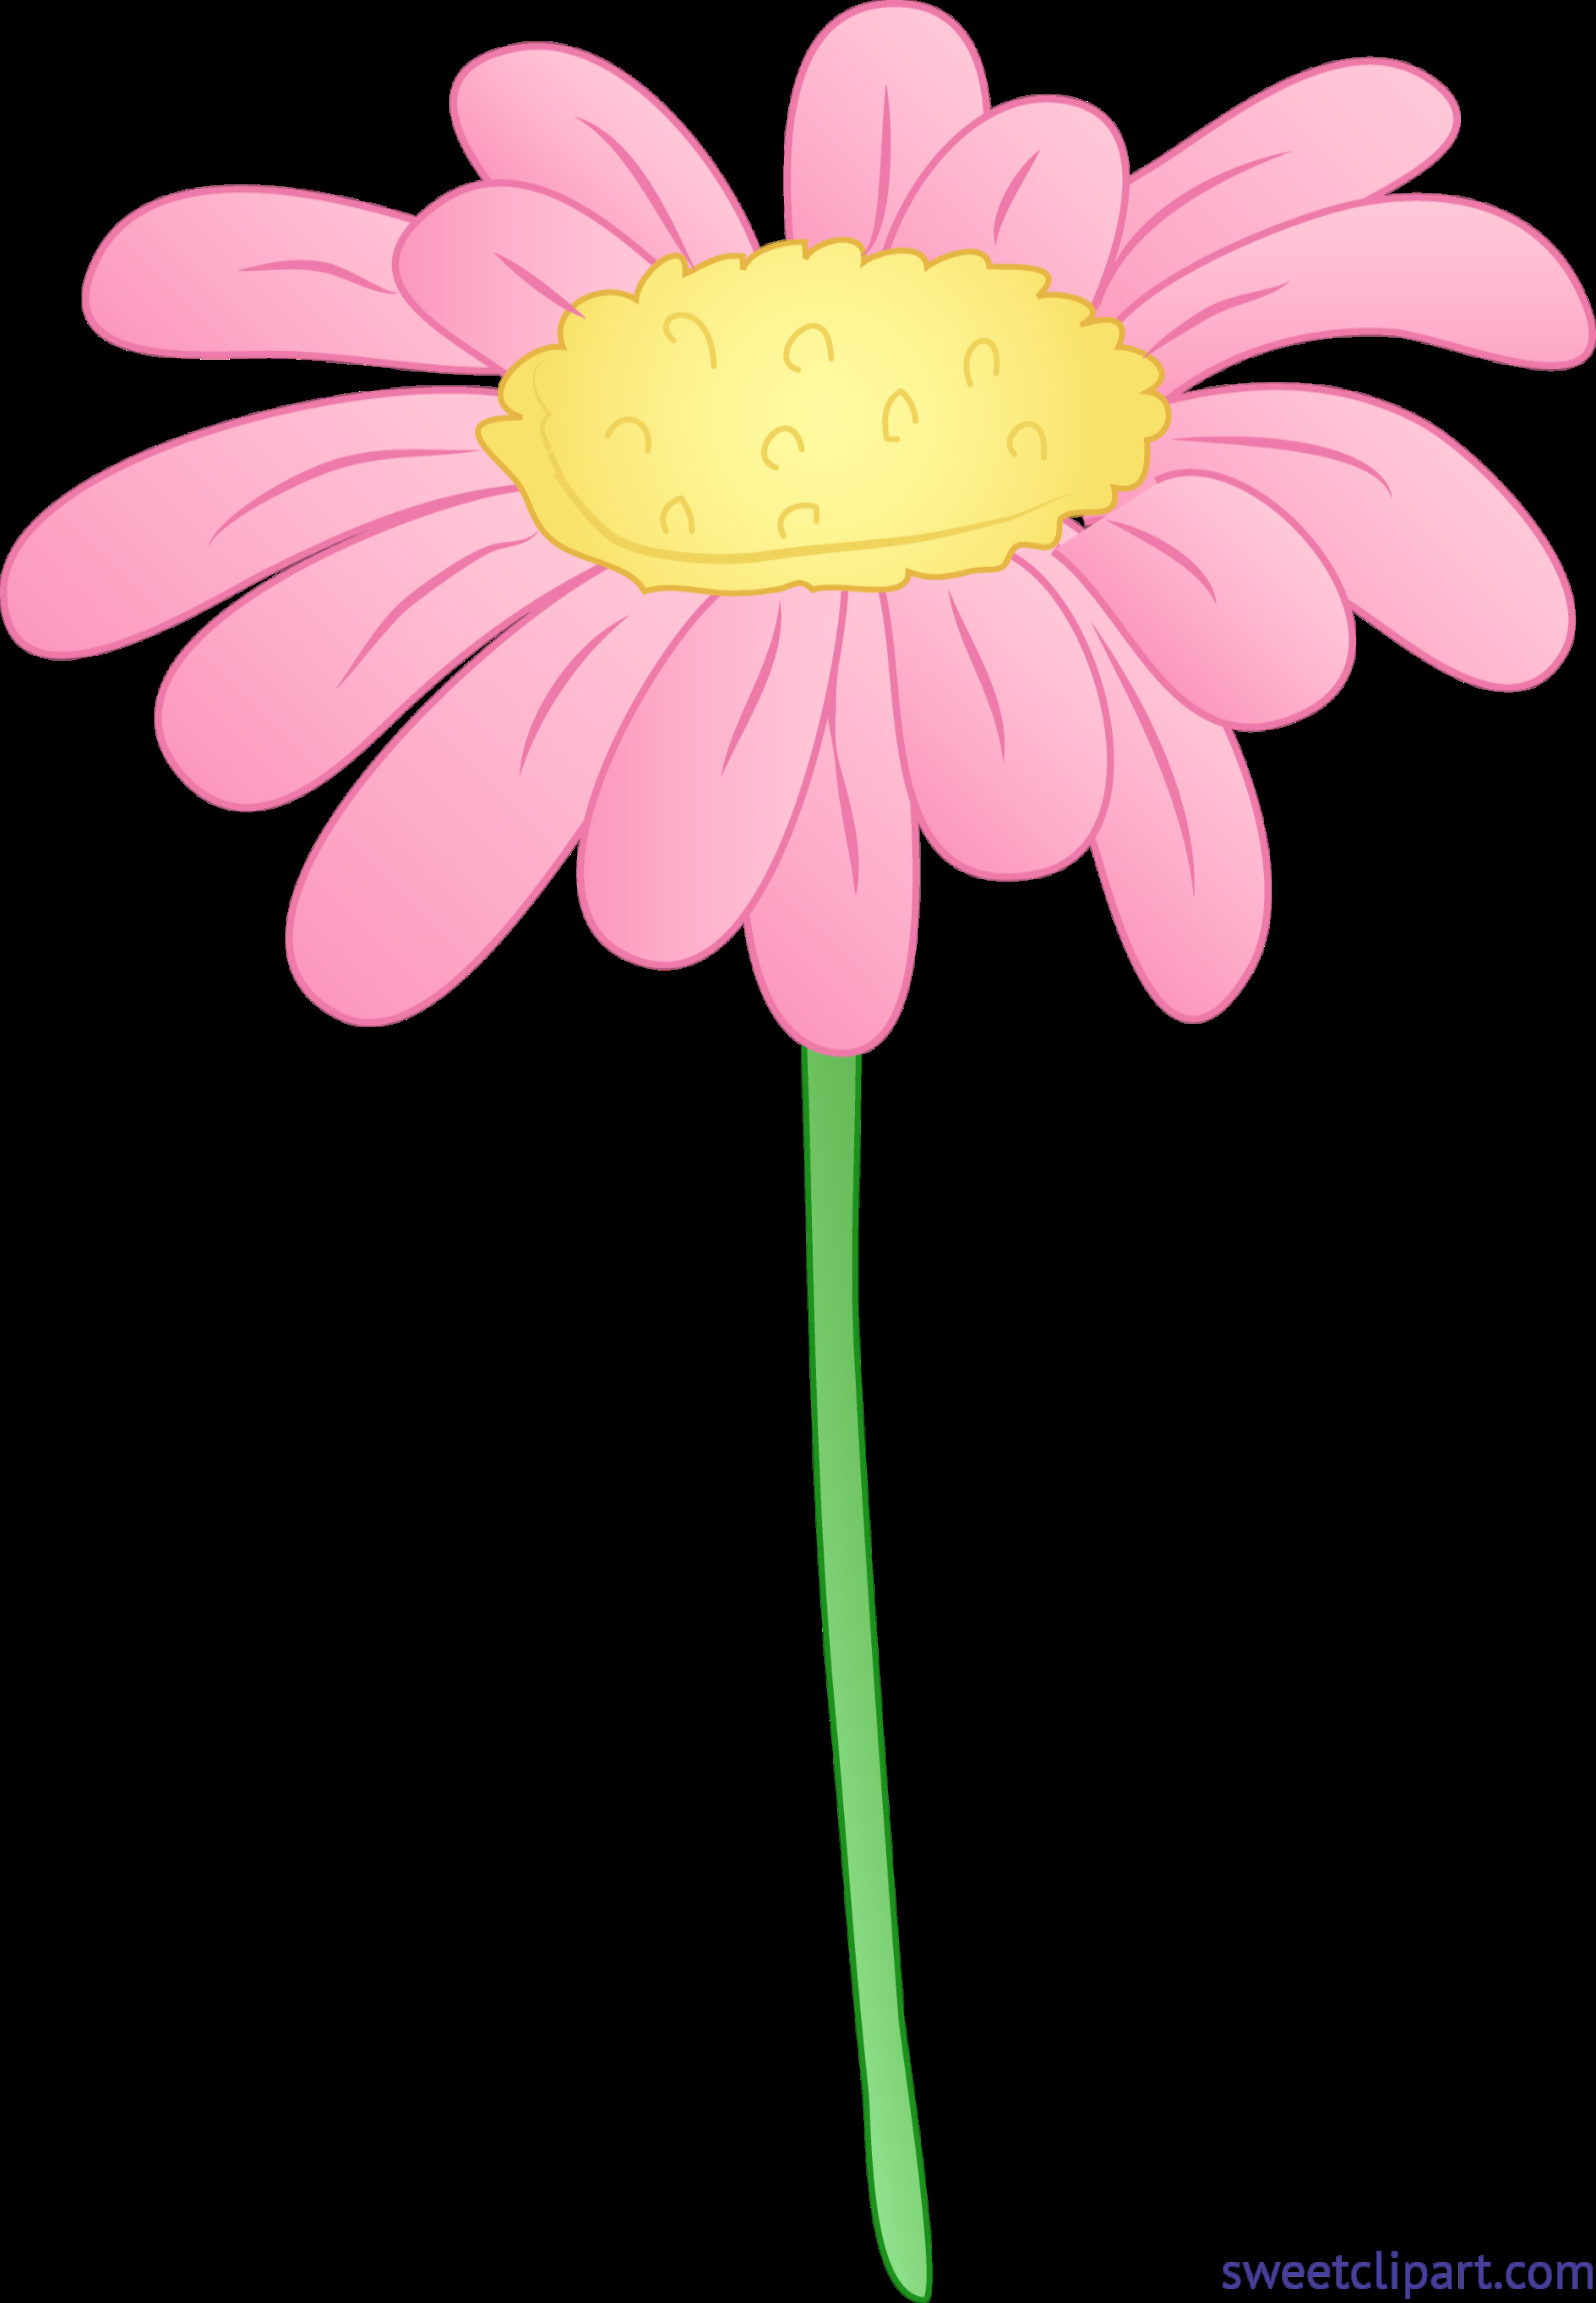 Daisies Clipart Flower Tumblr Daisies Flower Tumblr Transparent